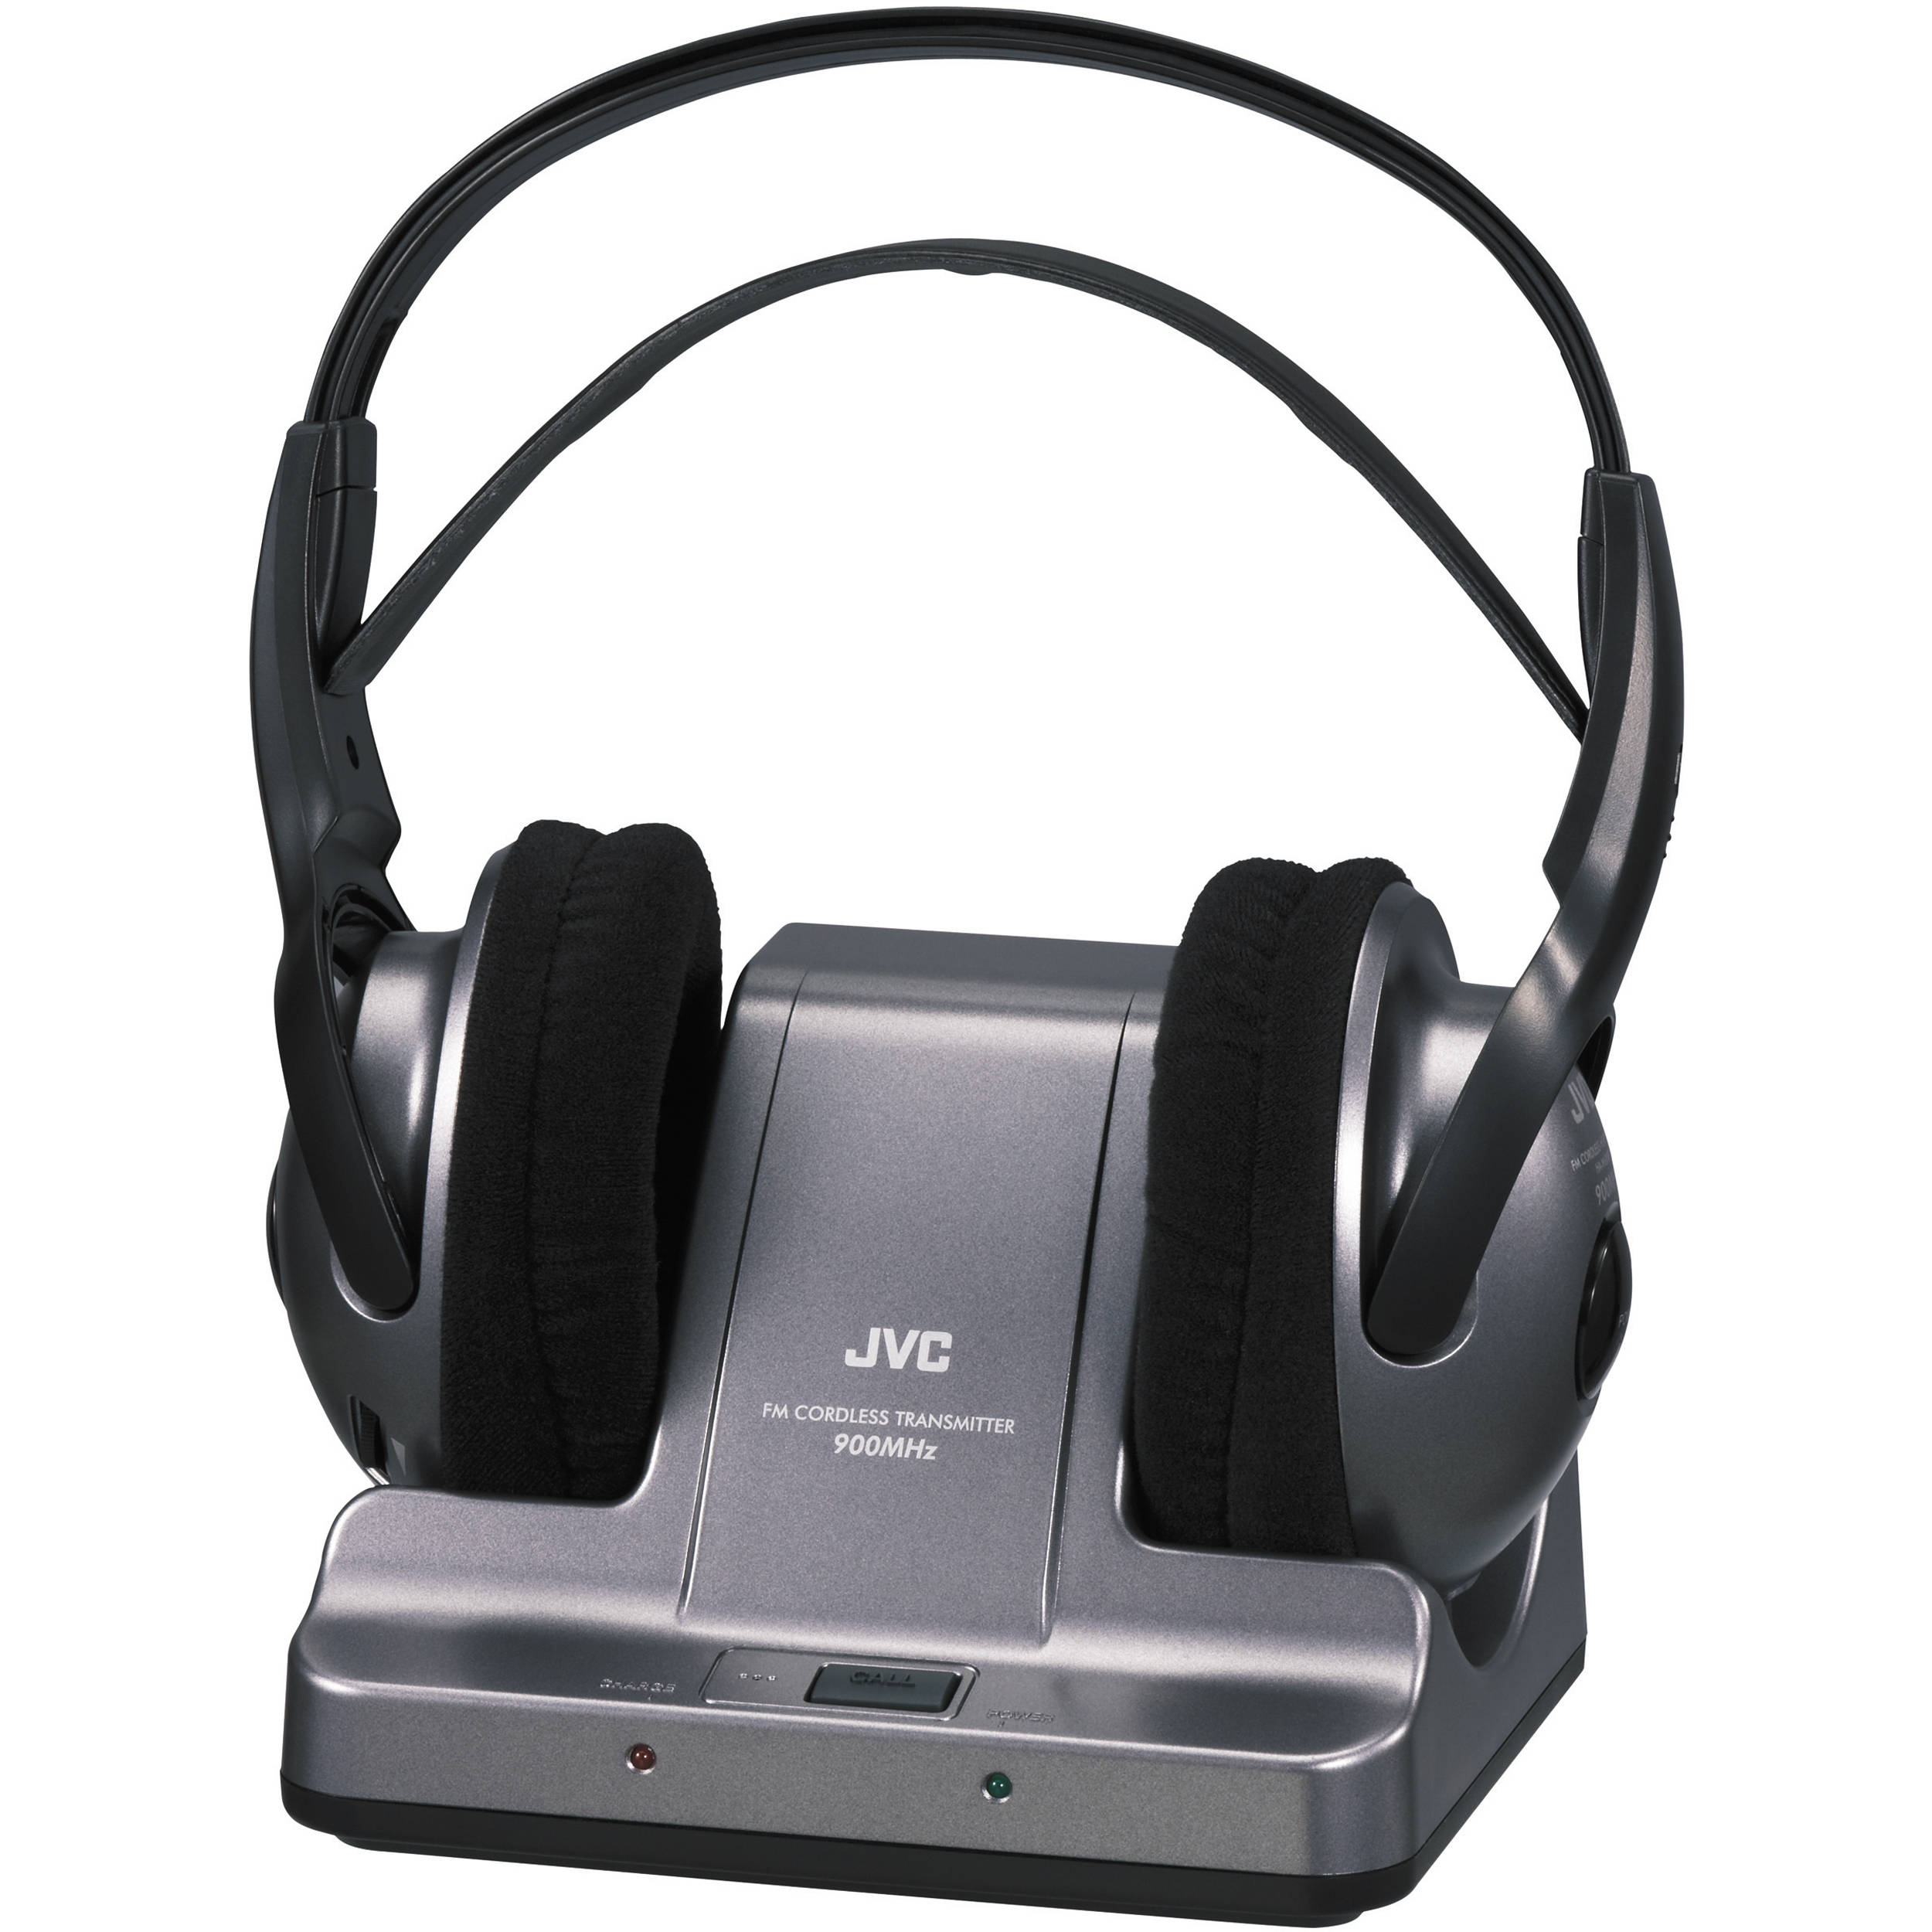 Wireless headphones jvc - jvc headphones charger